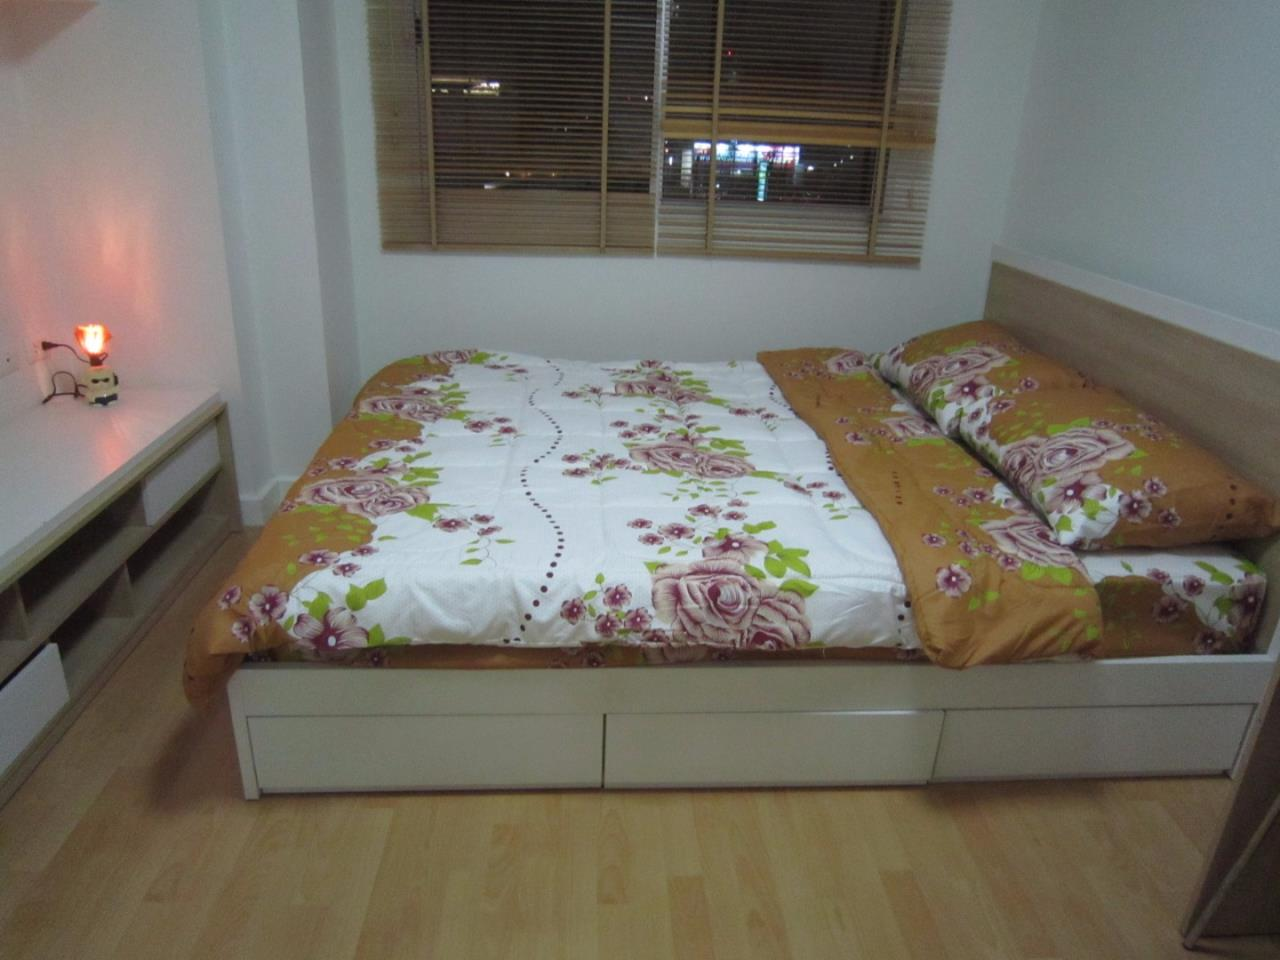 Quality Life Property Agency's S A L E! My Condo Sukhumvit 52 | 1 BED 1 BATH | 35.4 SQ. M. 1